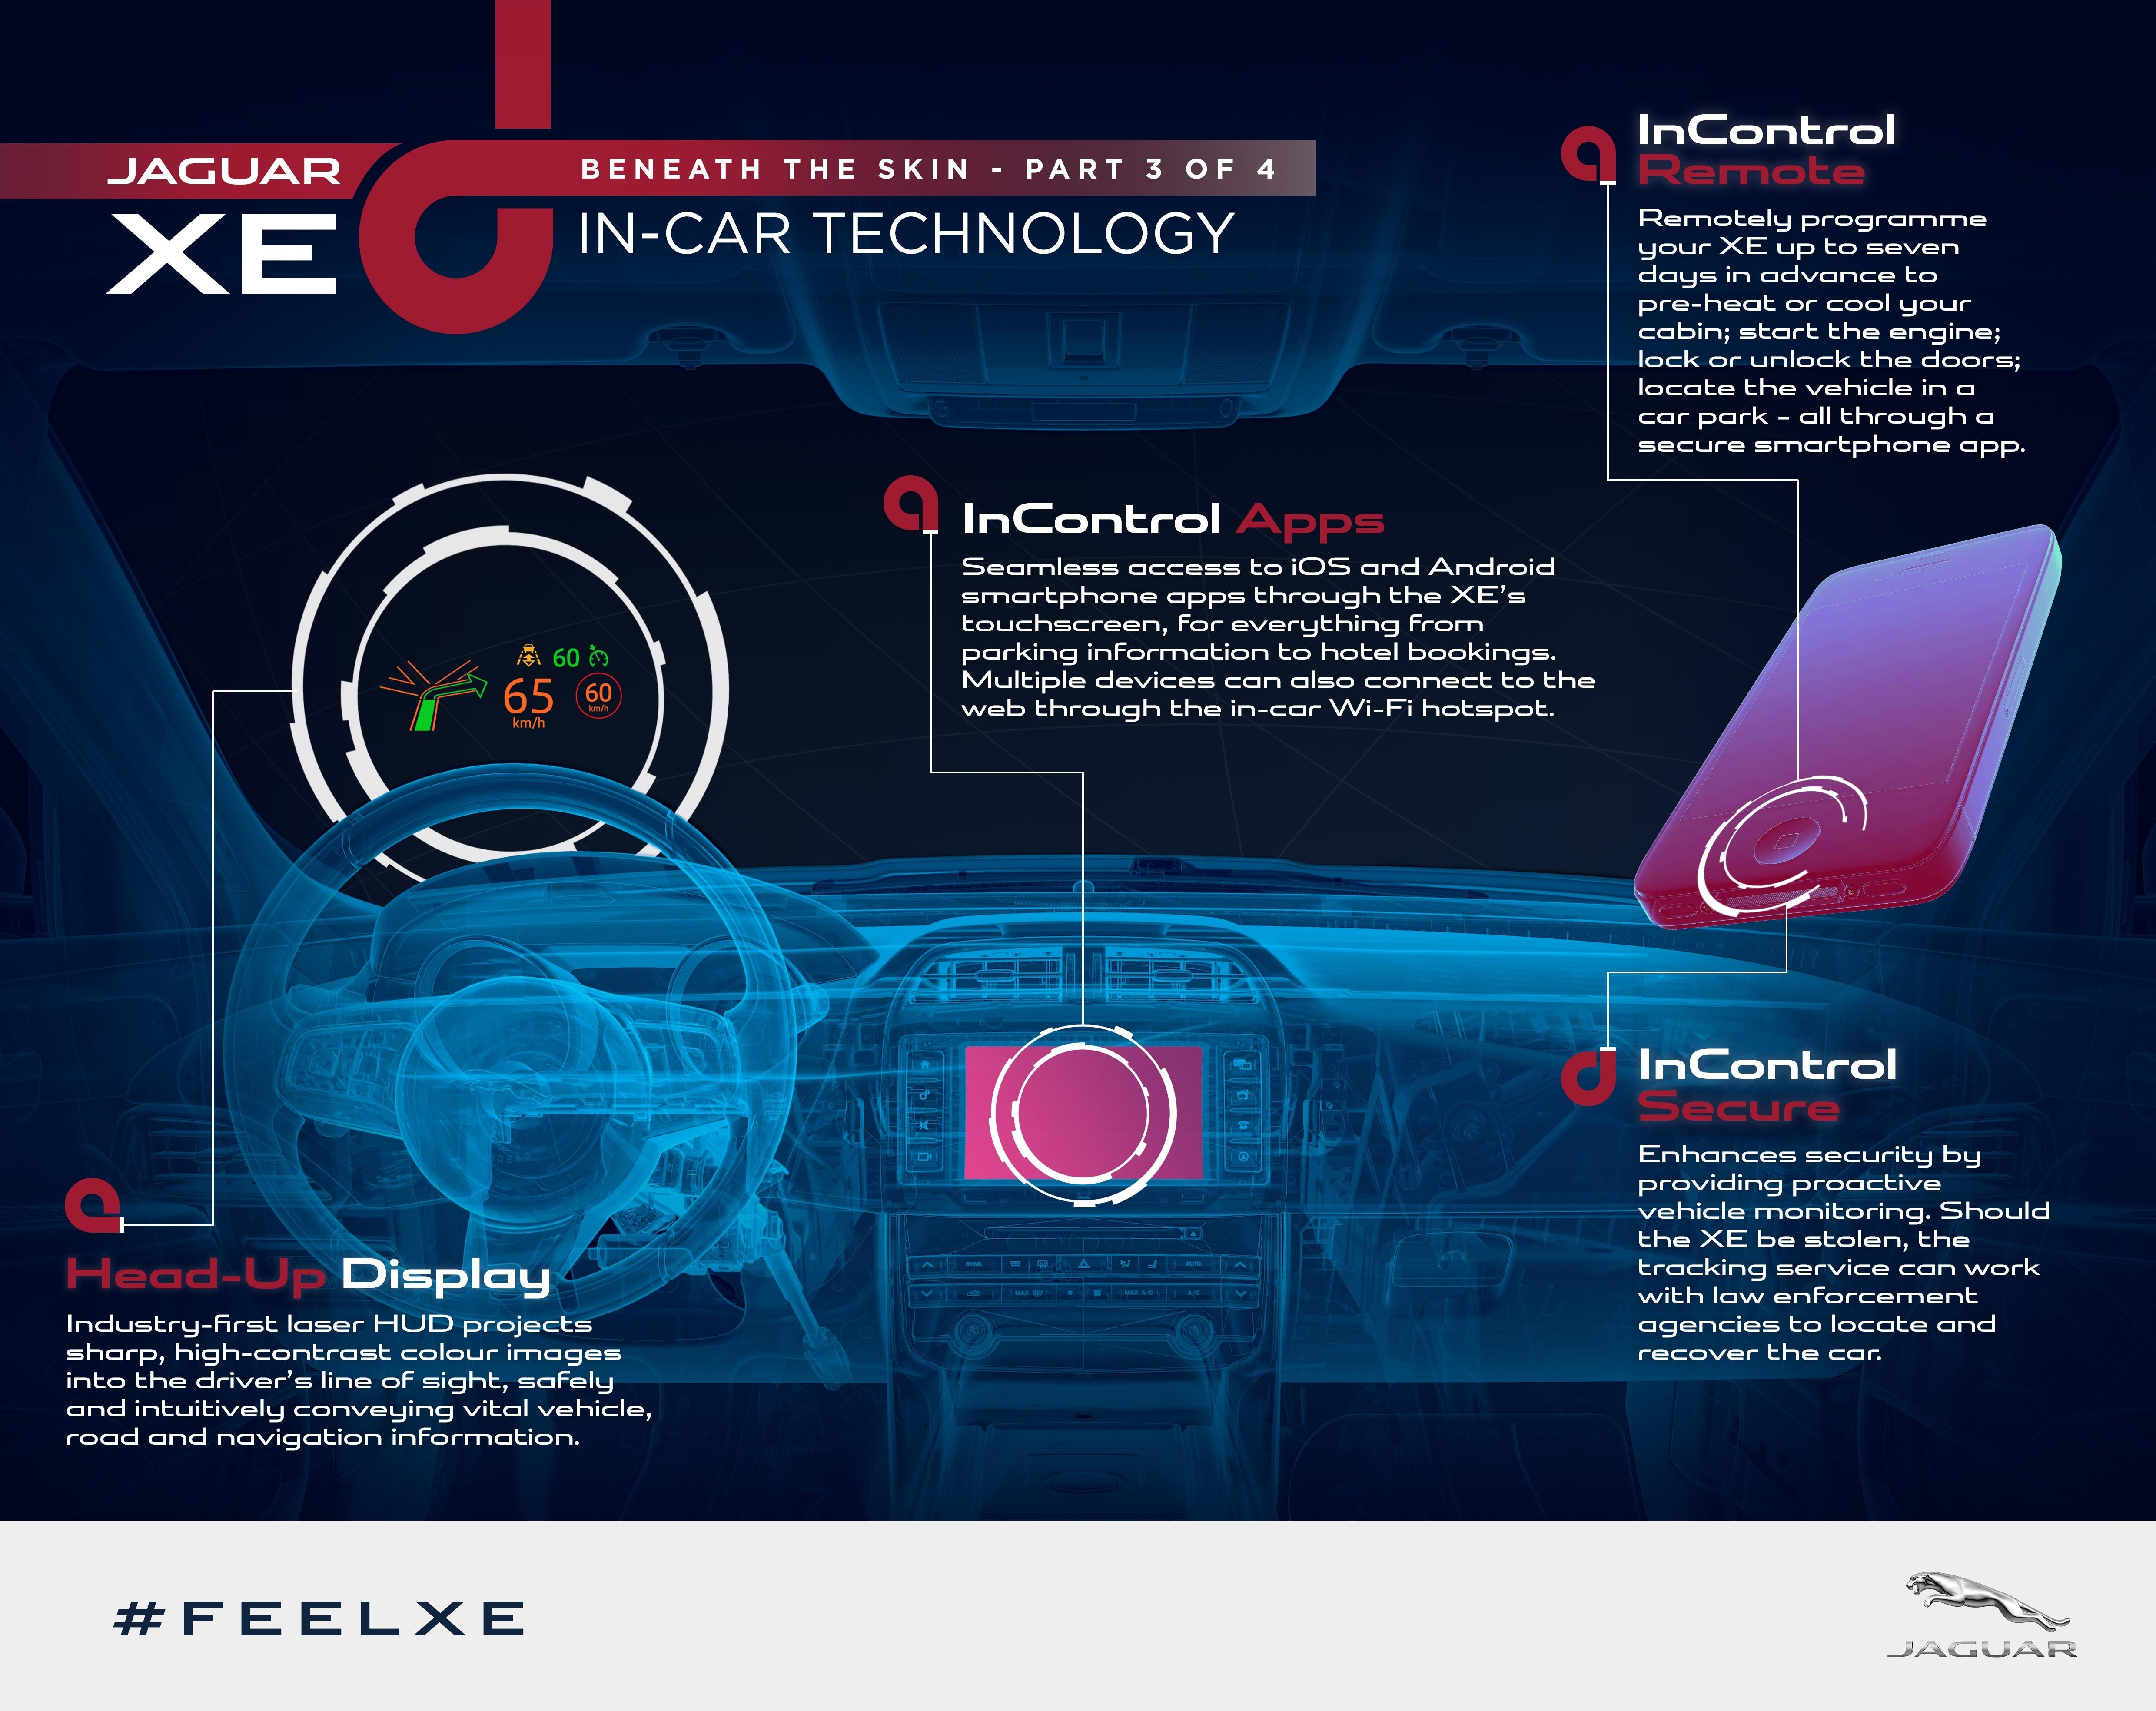 jag_xe_incartech_infographic_190814